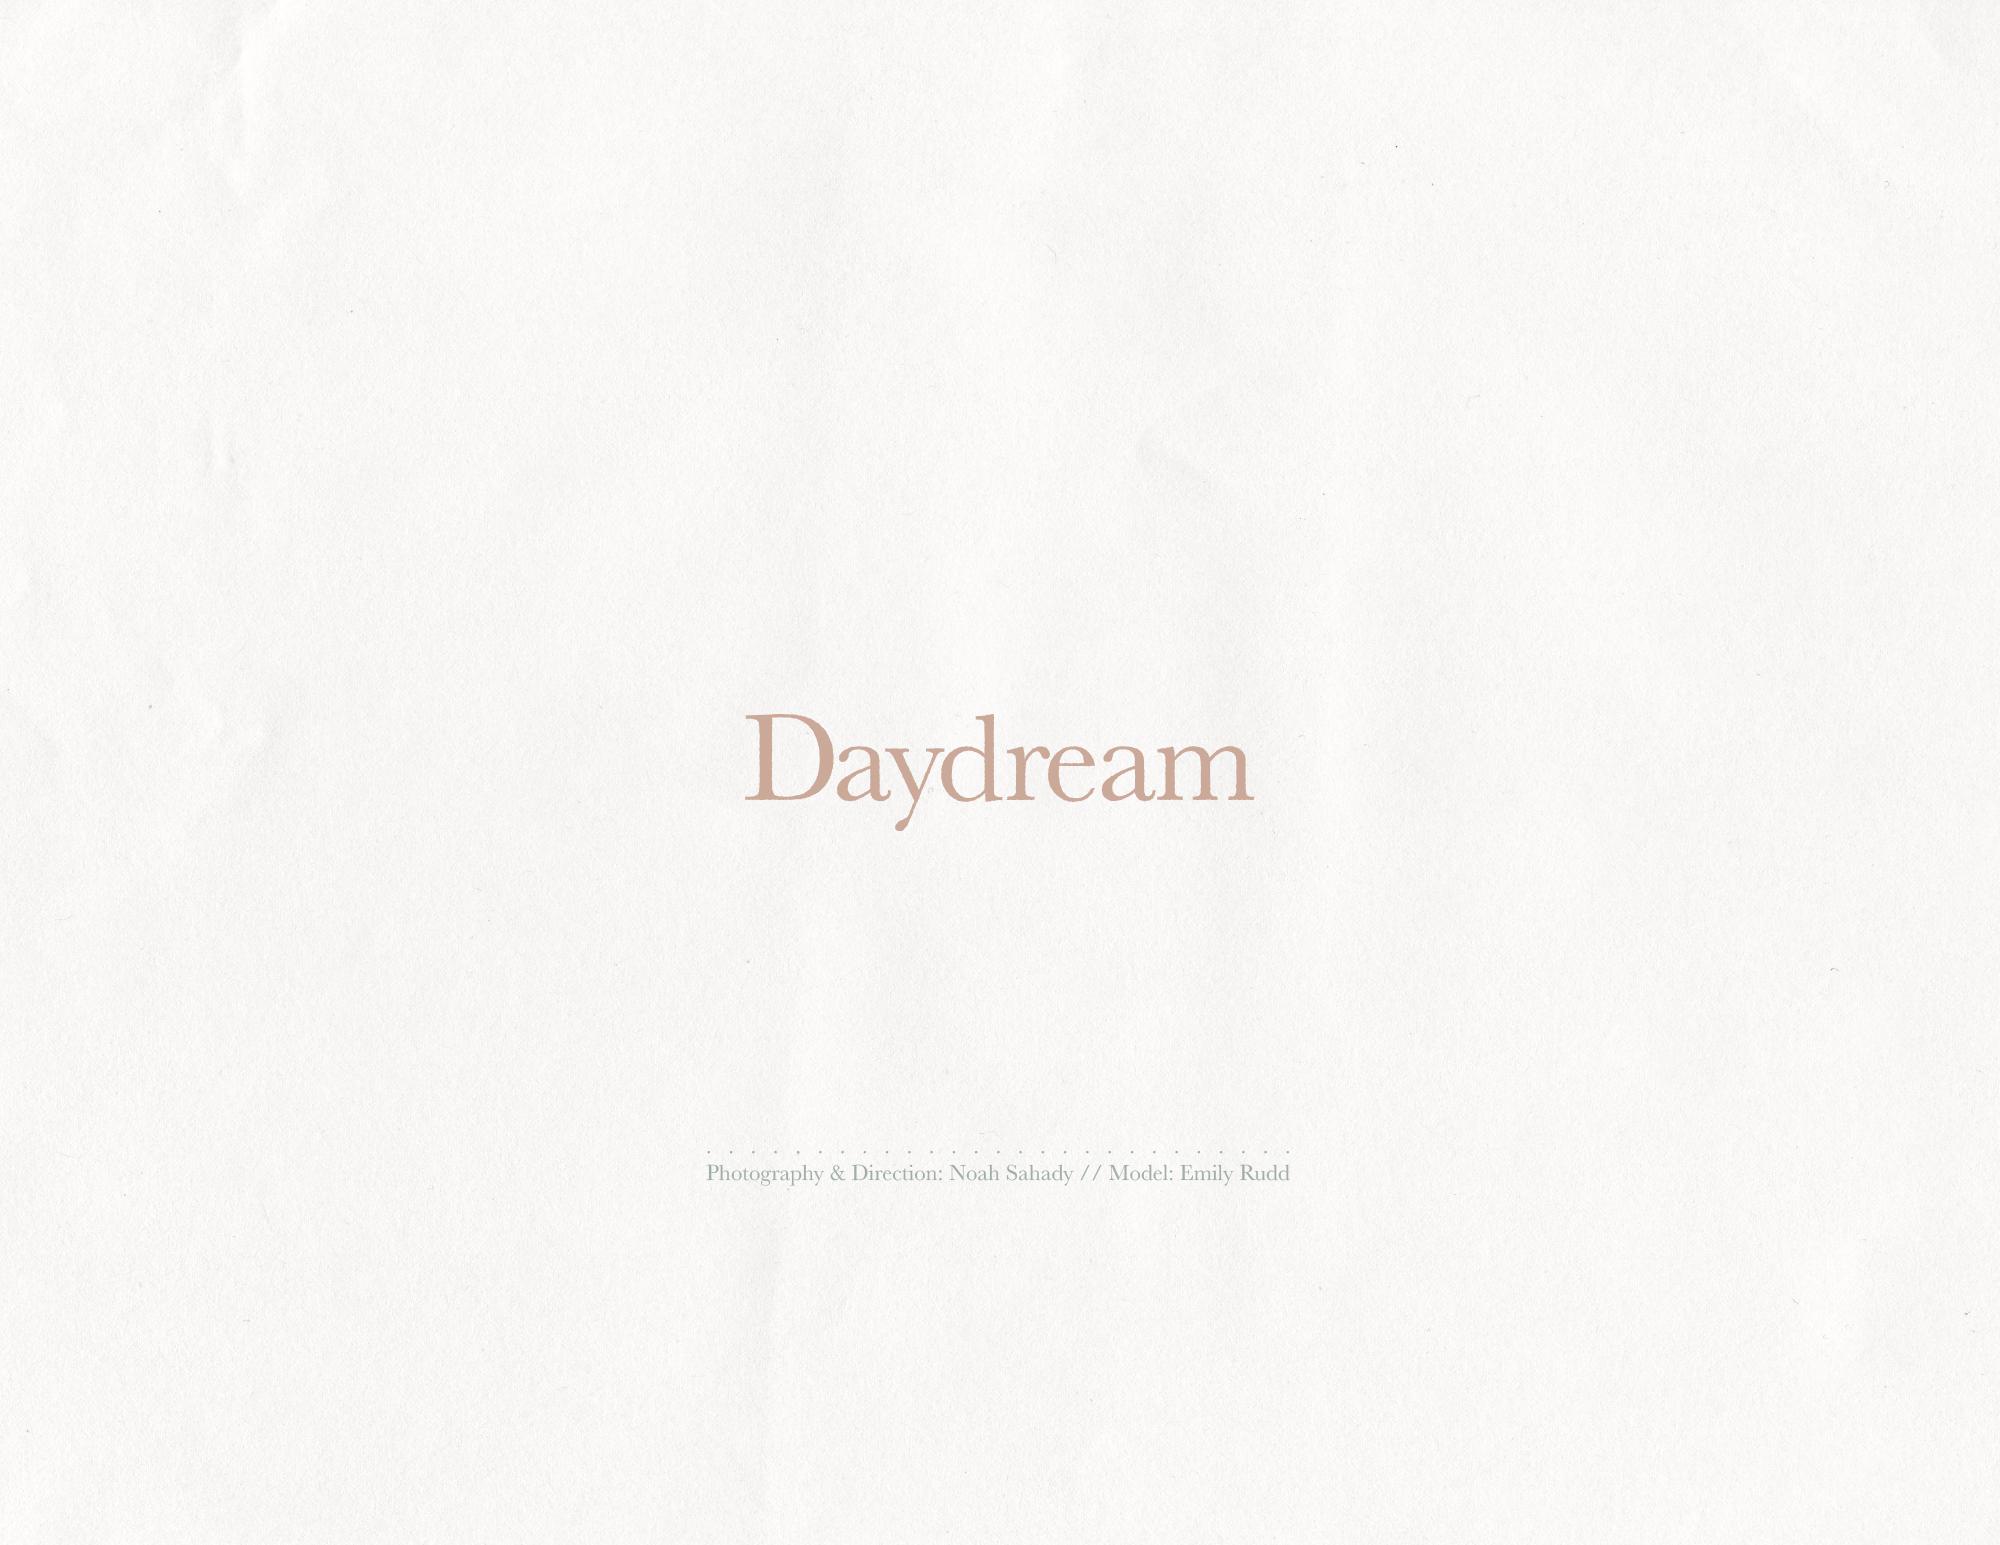 sahady_Daydream_1.jpg